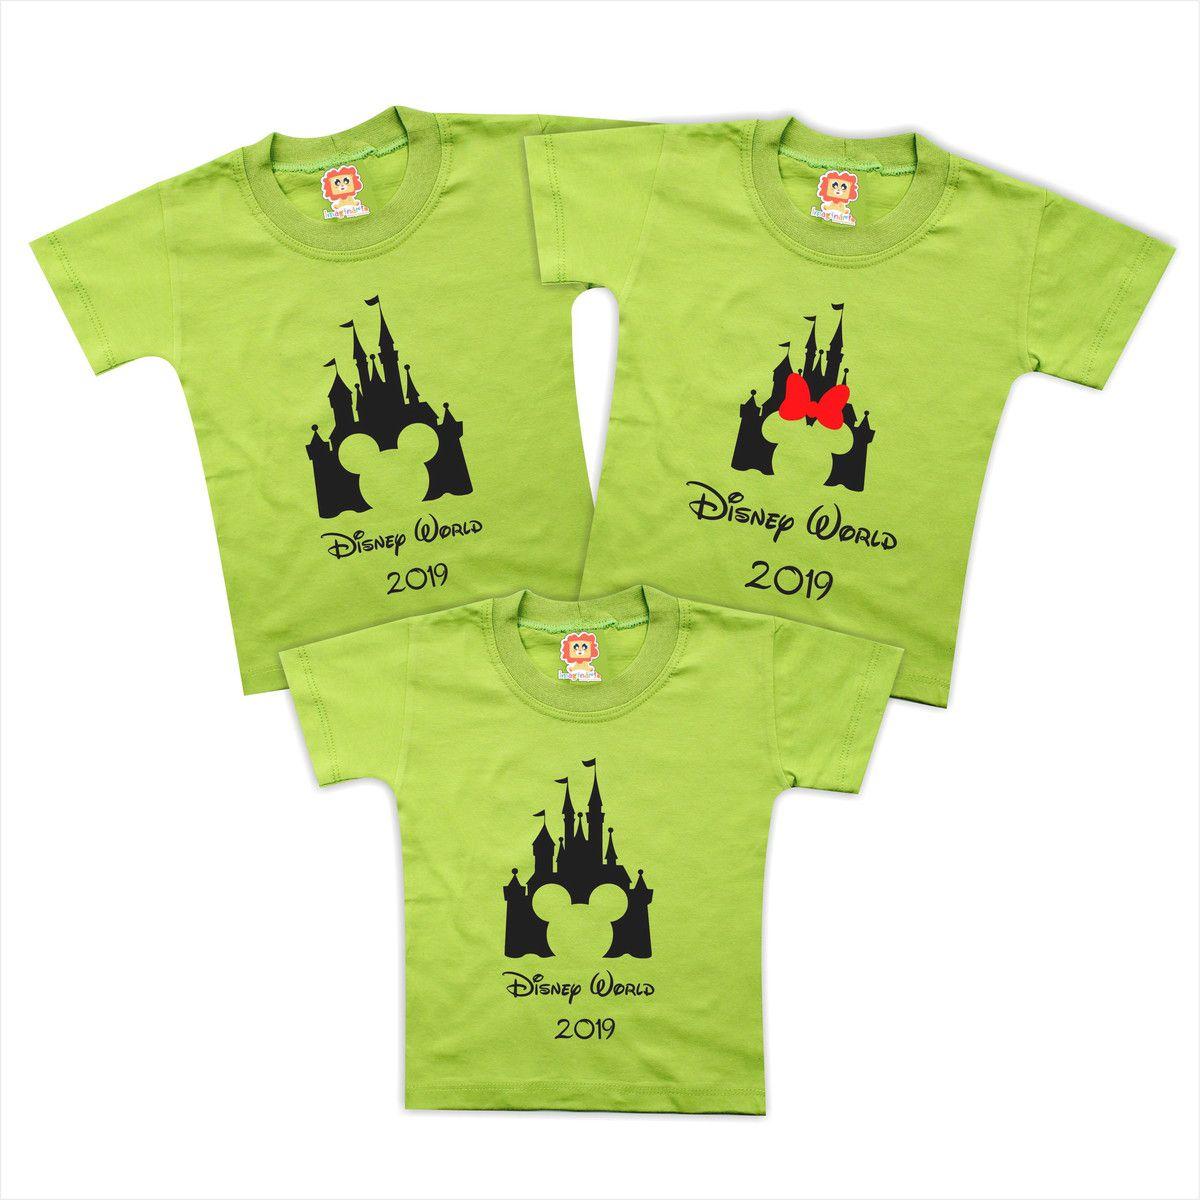 Kit Camisetas Personalizadas Disney Mickey e Minnie Viagem Orlando